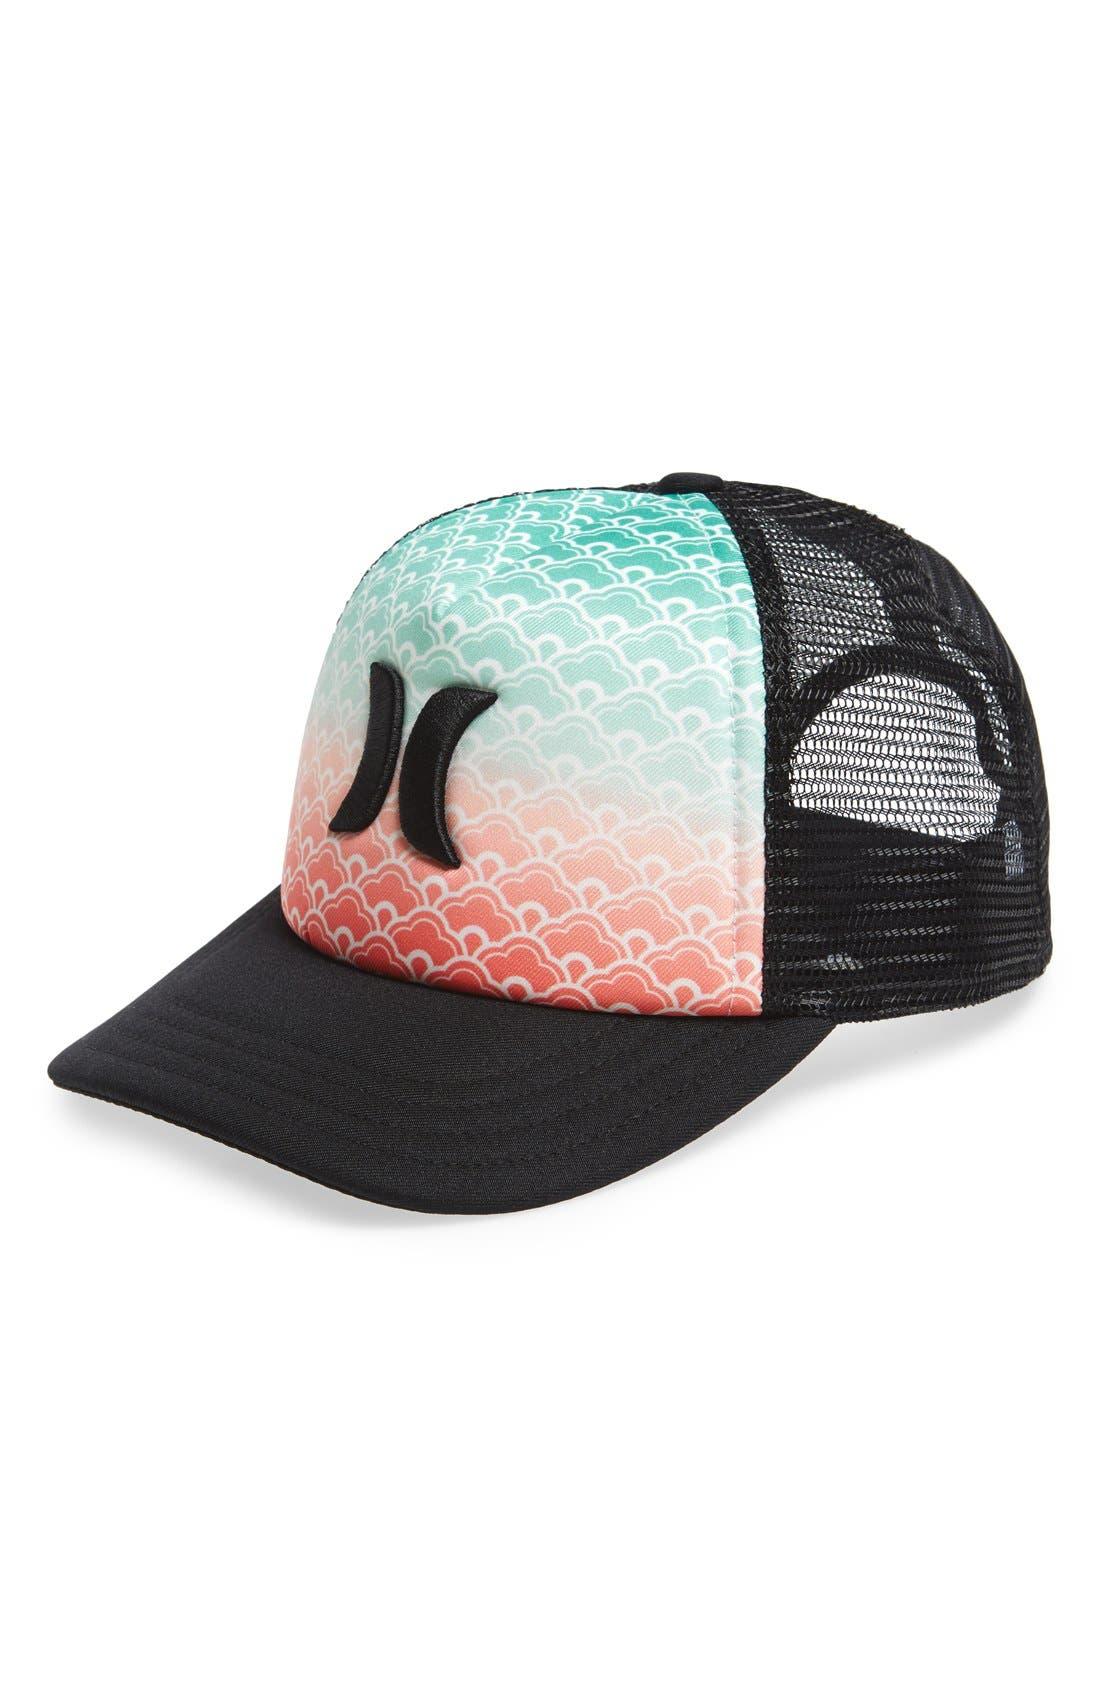 Main Image - Hurley 'Americana' Trucker Hat